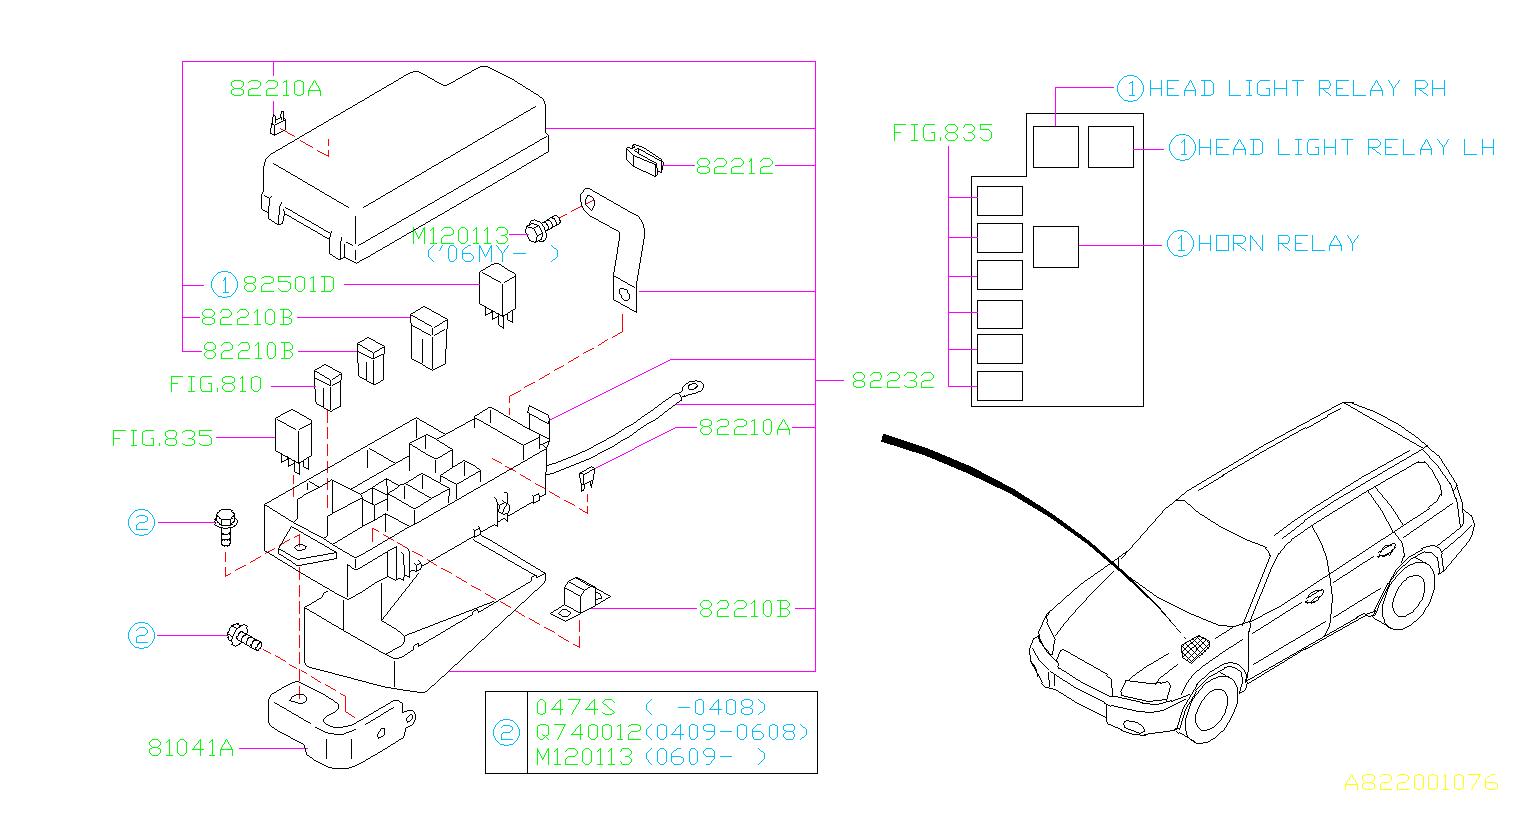 82211fc120 - Fuse-main  Box